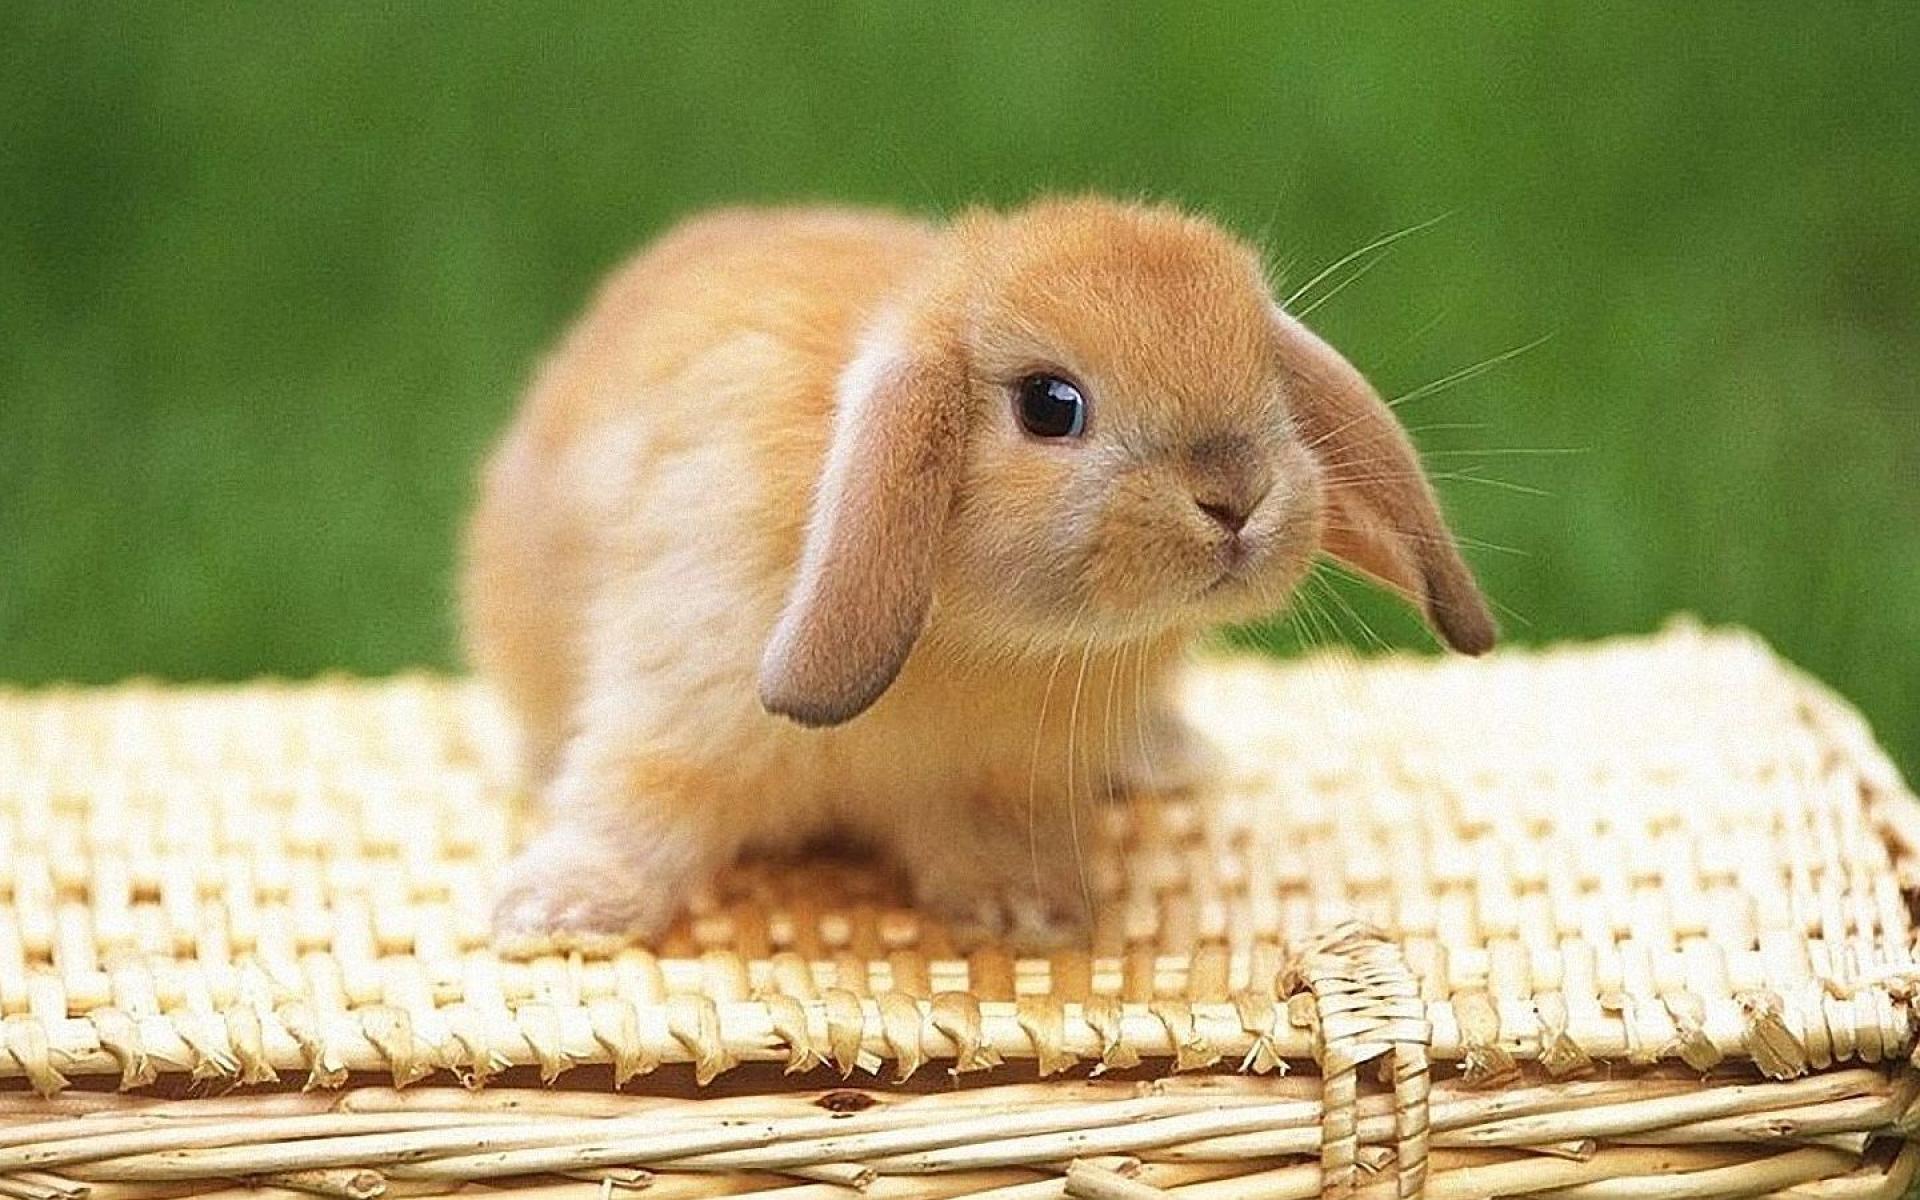 Bunny Macro Wallpaper Hd 1920x1200PX ~ Wallpaper Bunnies #8792